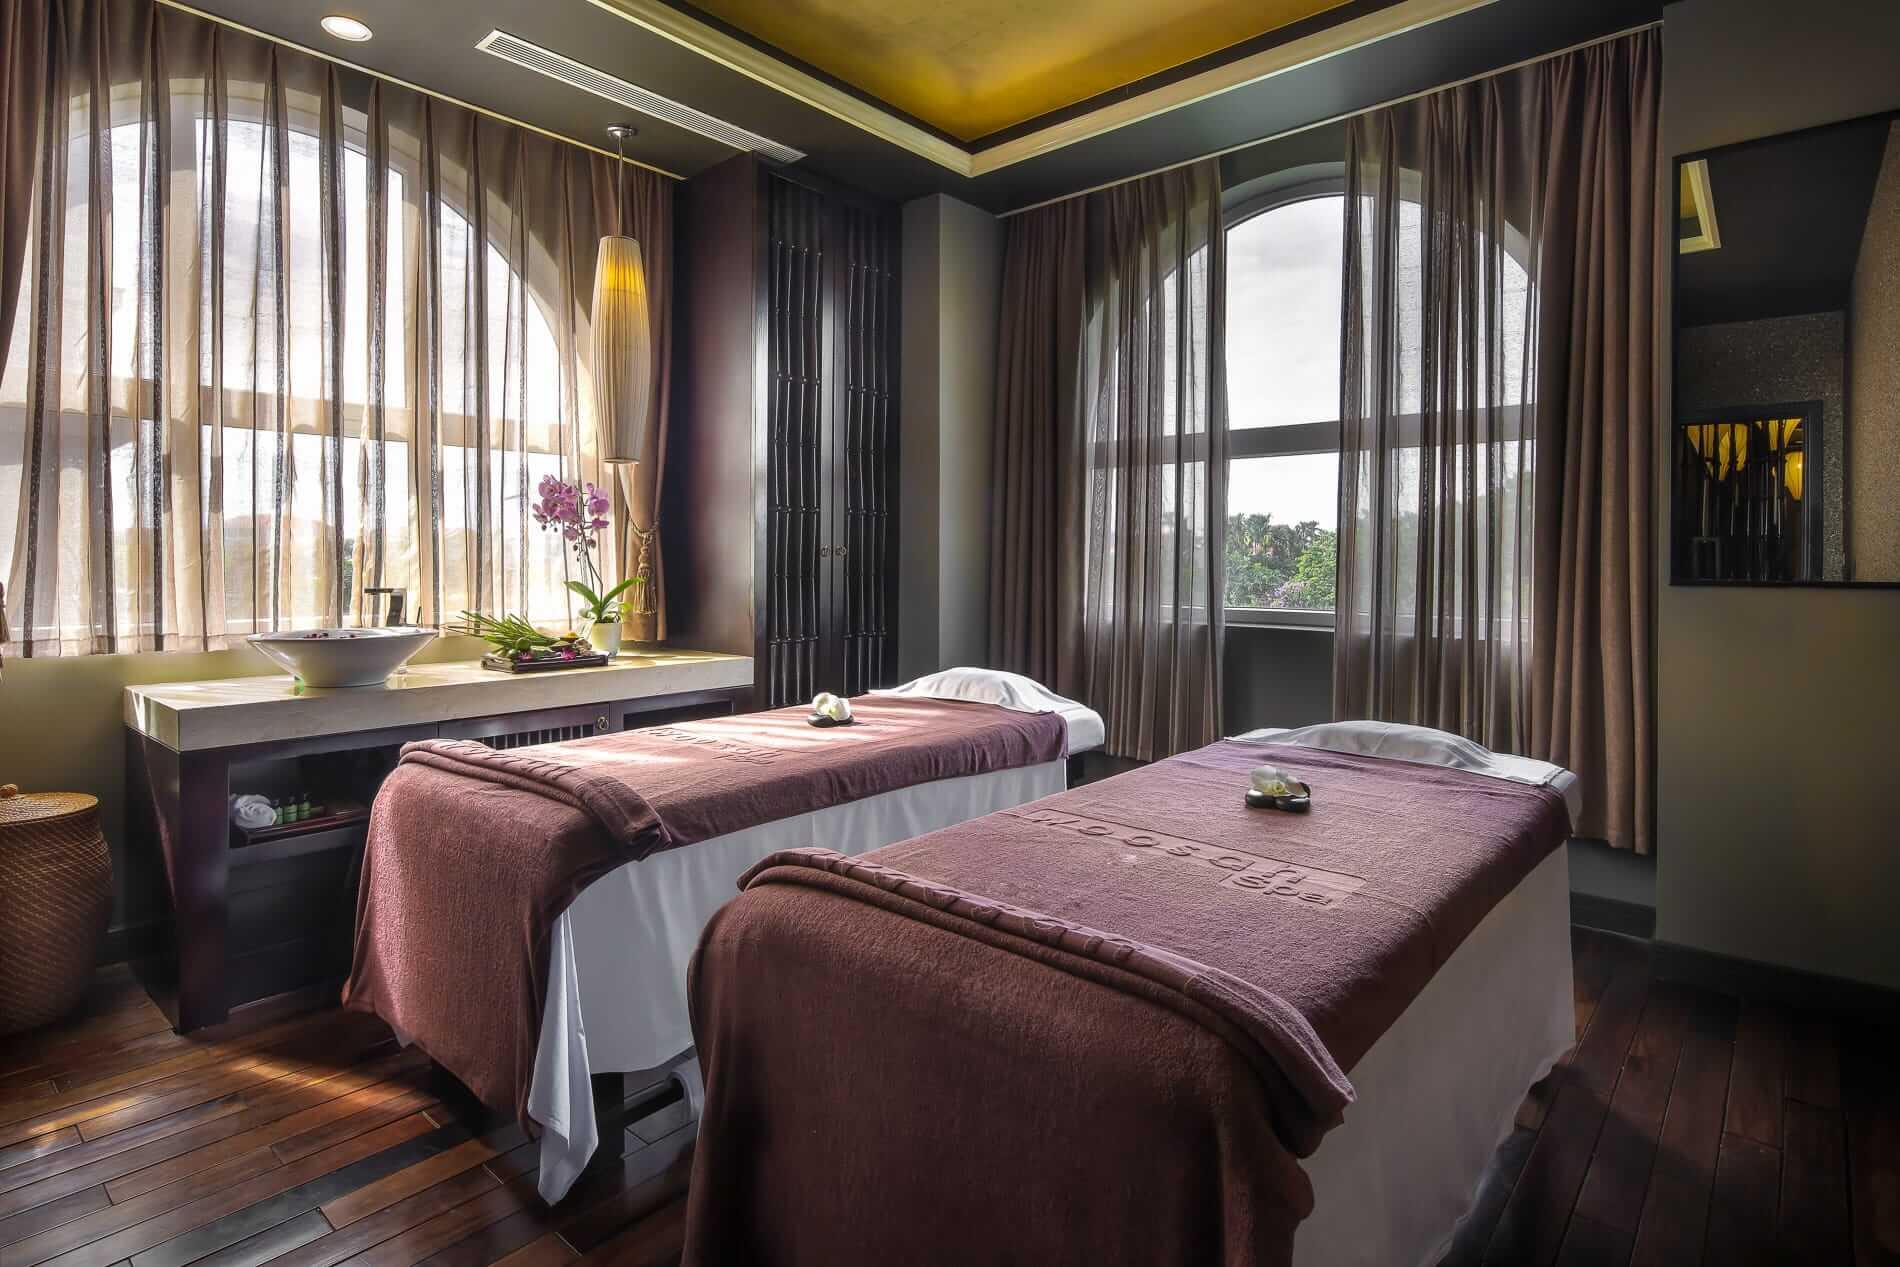 Treatment room for couples at Woosah Spa